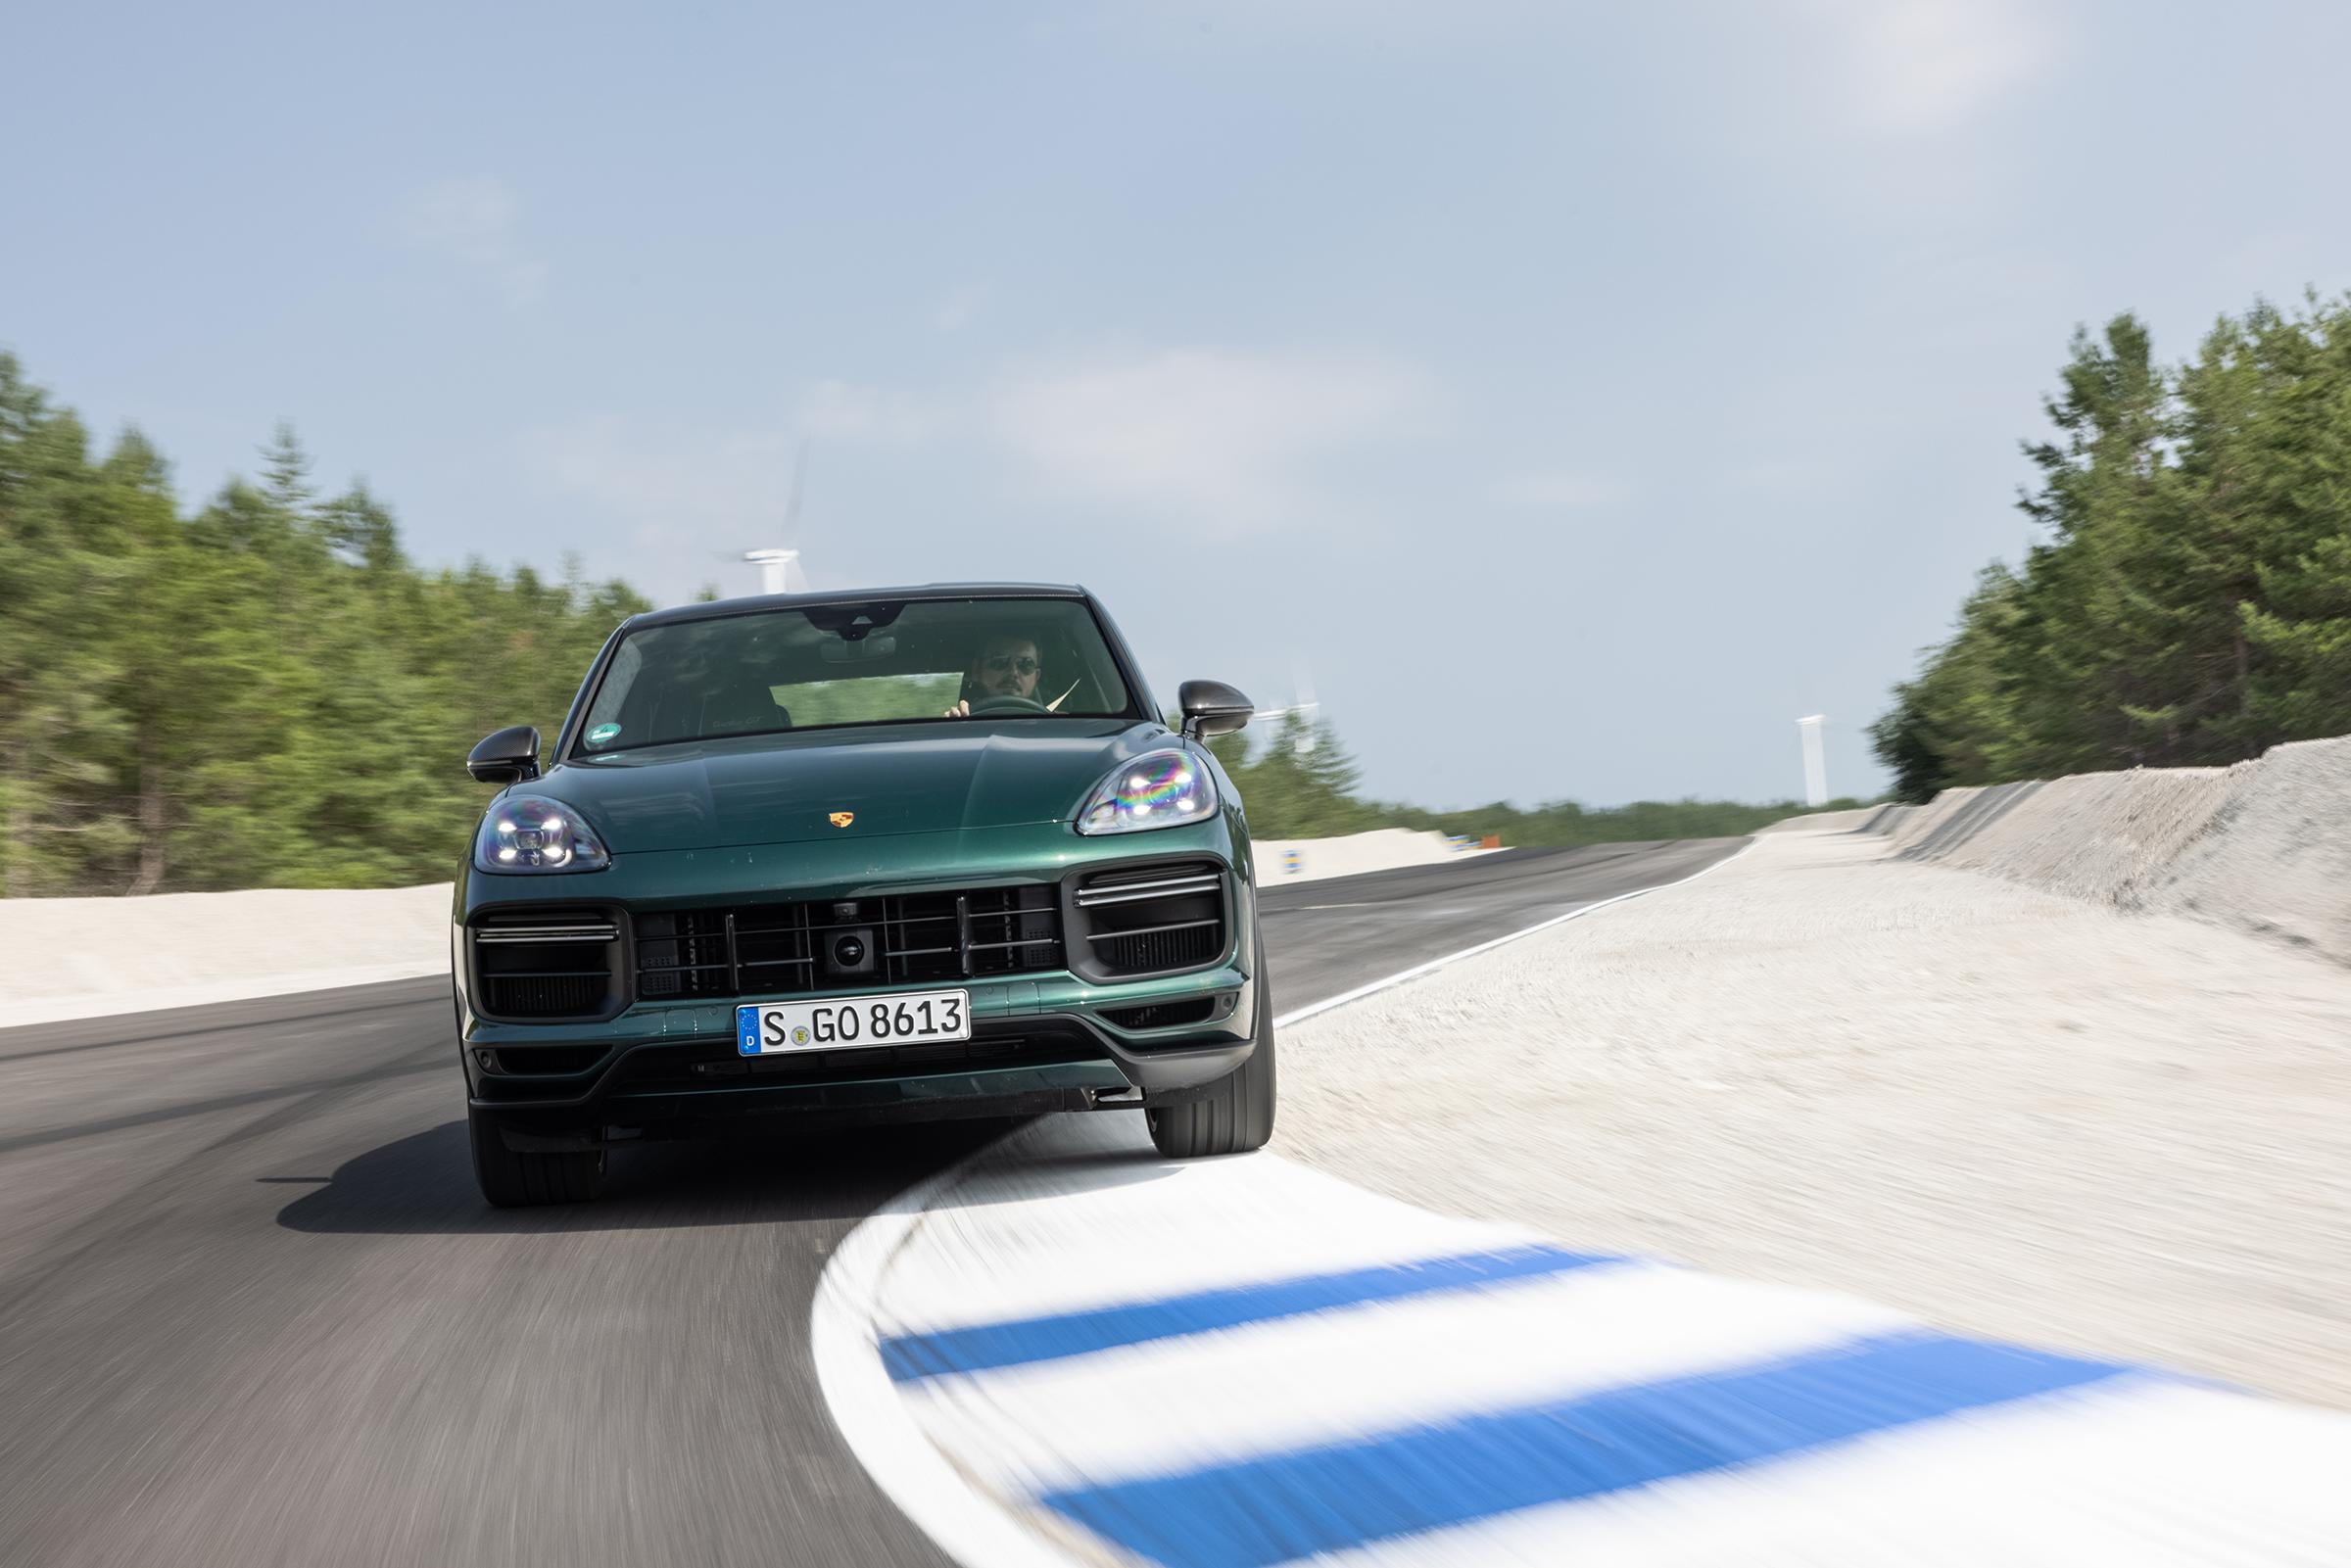 Porsche-Cayenne-Turbo-GT-Dynamic